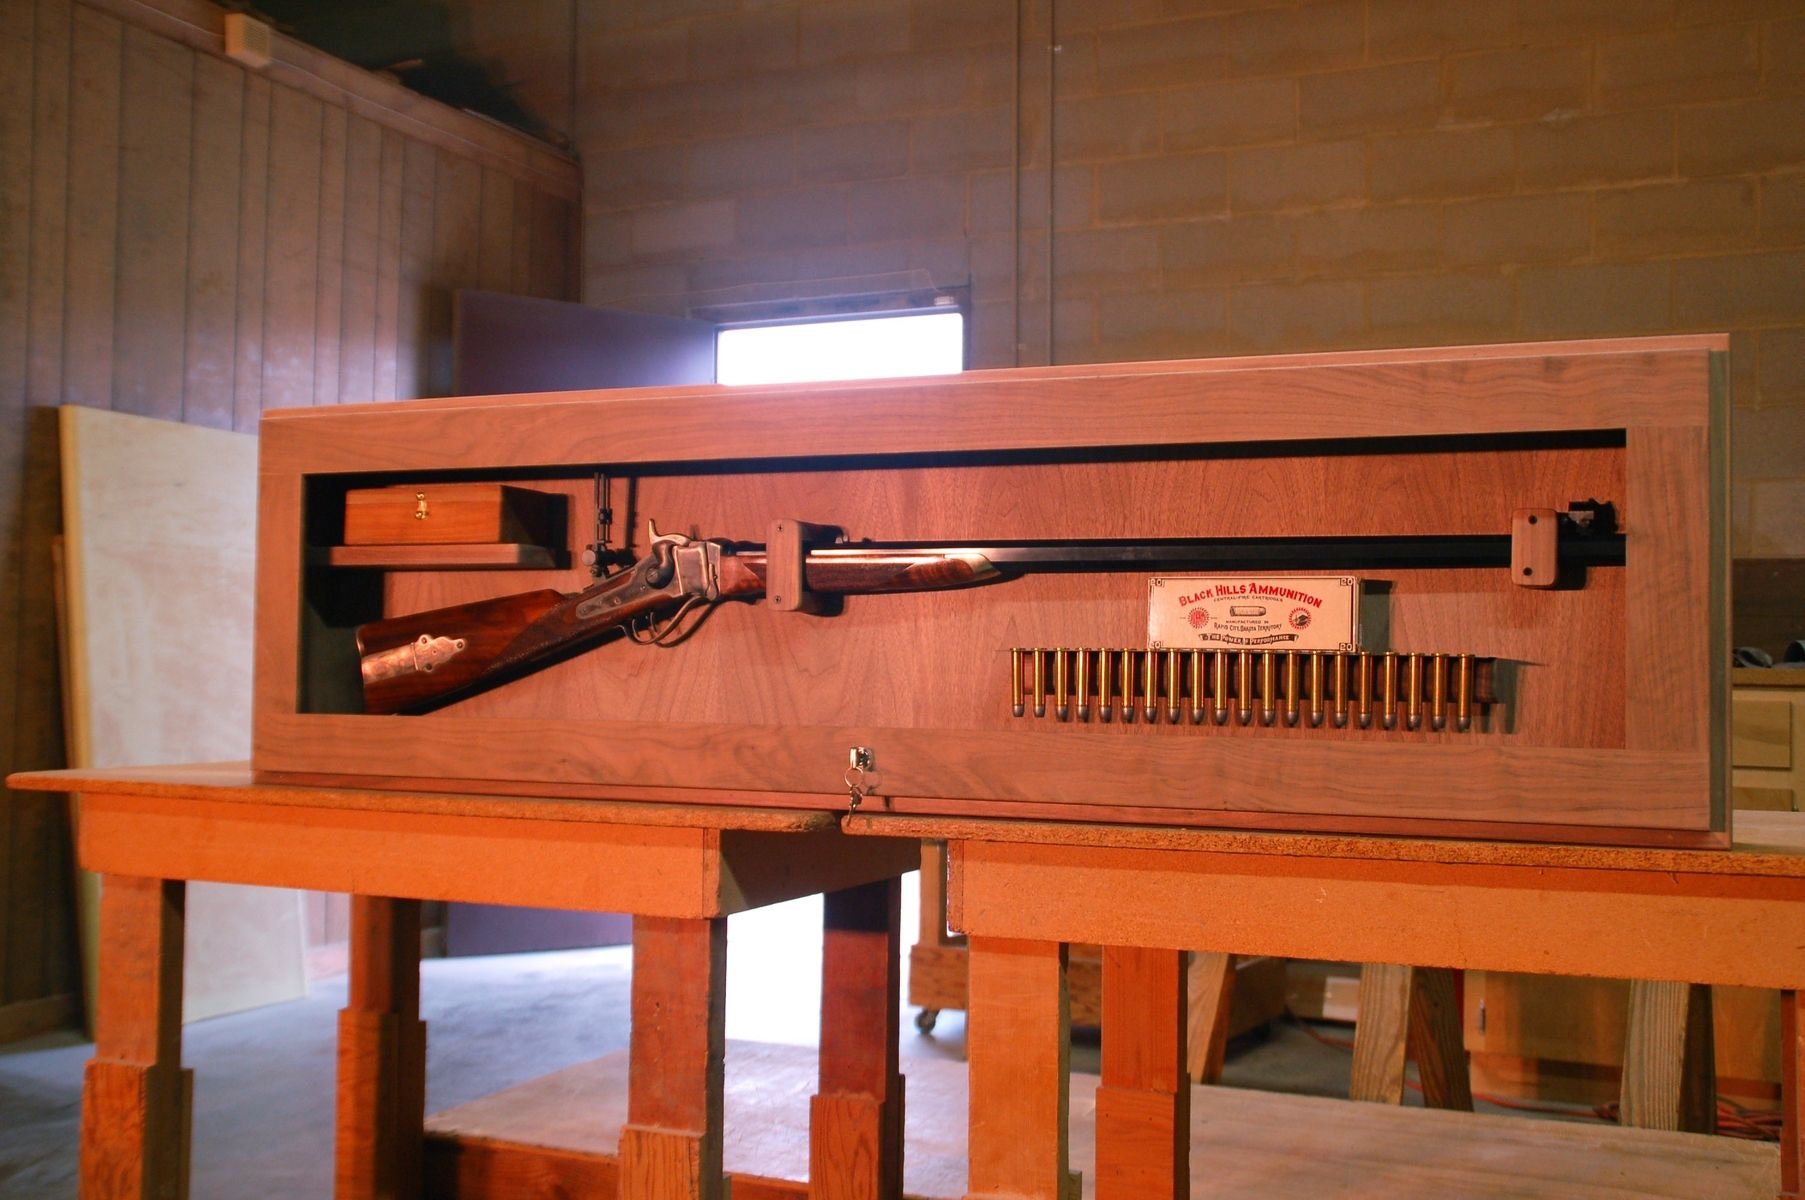 Double pistol handgun revolver gun display case cabinet rack shadowbox - Flintlock Display Case